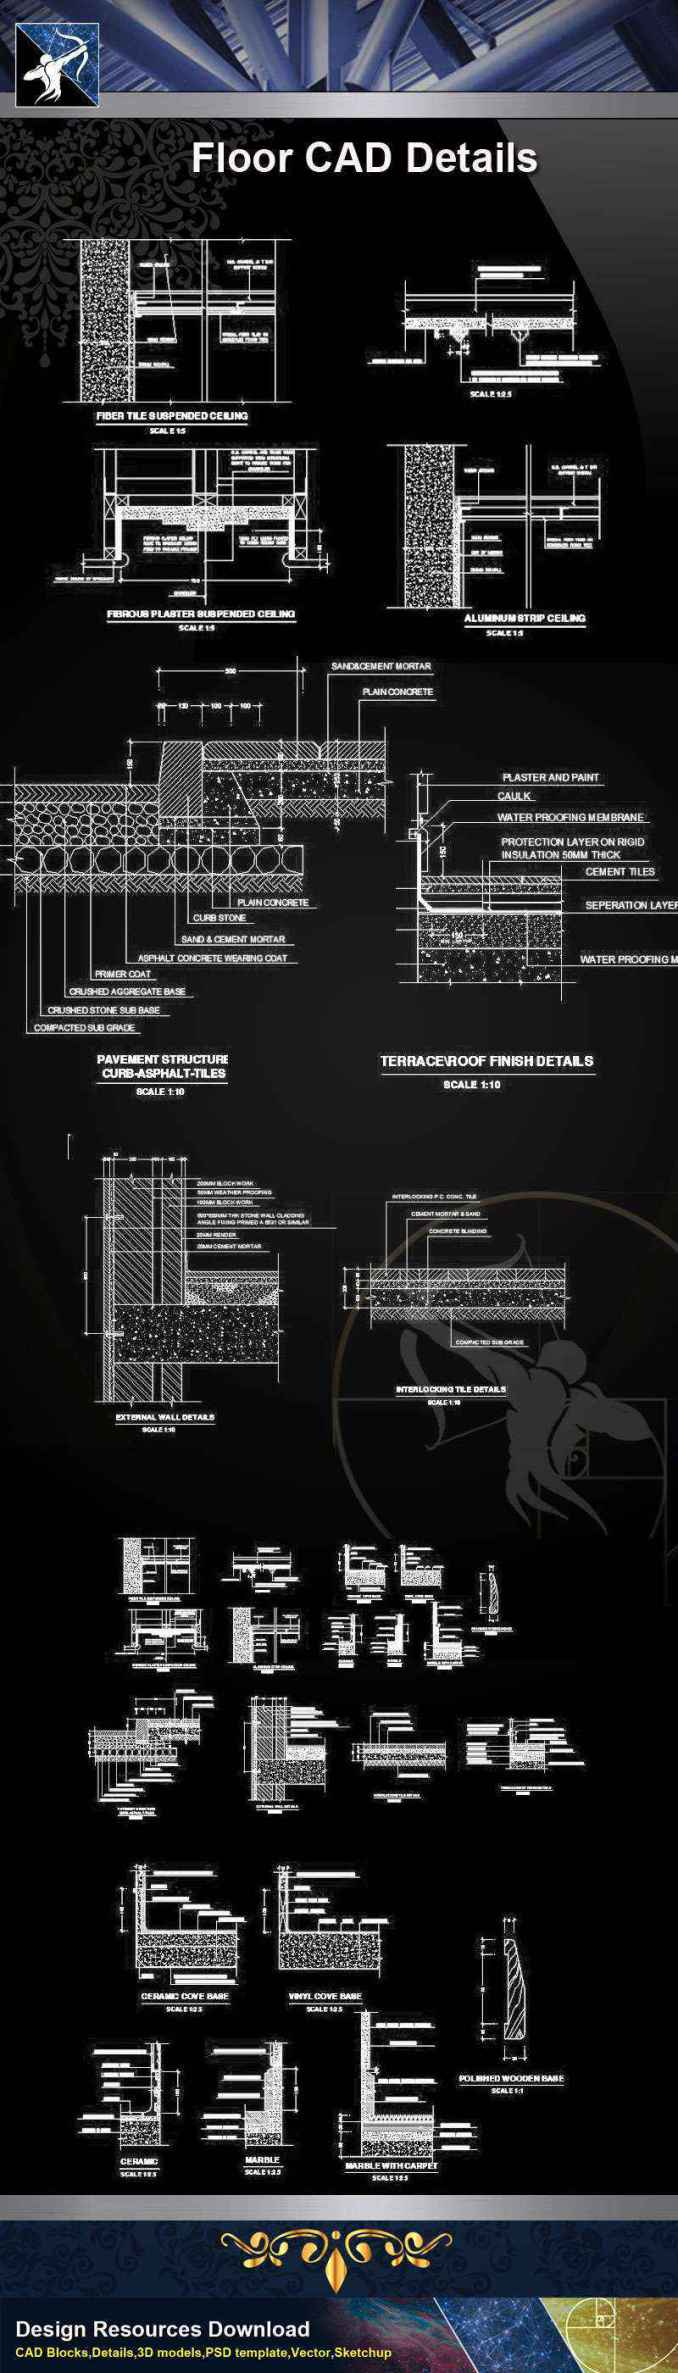 Architecture Cad Details Collections Flooring Cad Details V 1